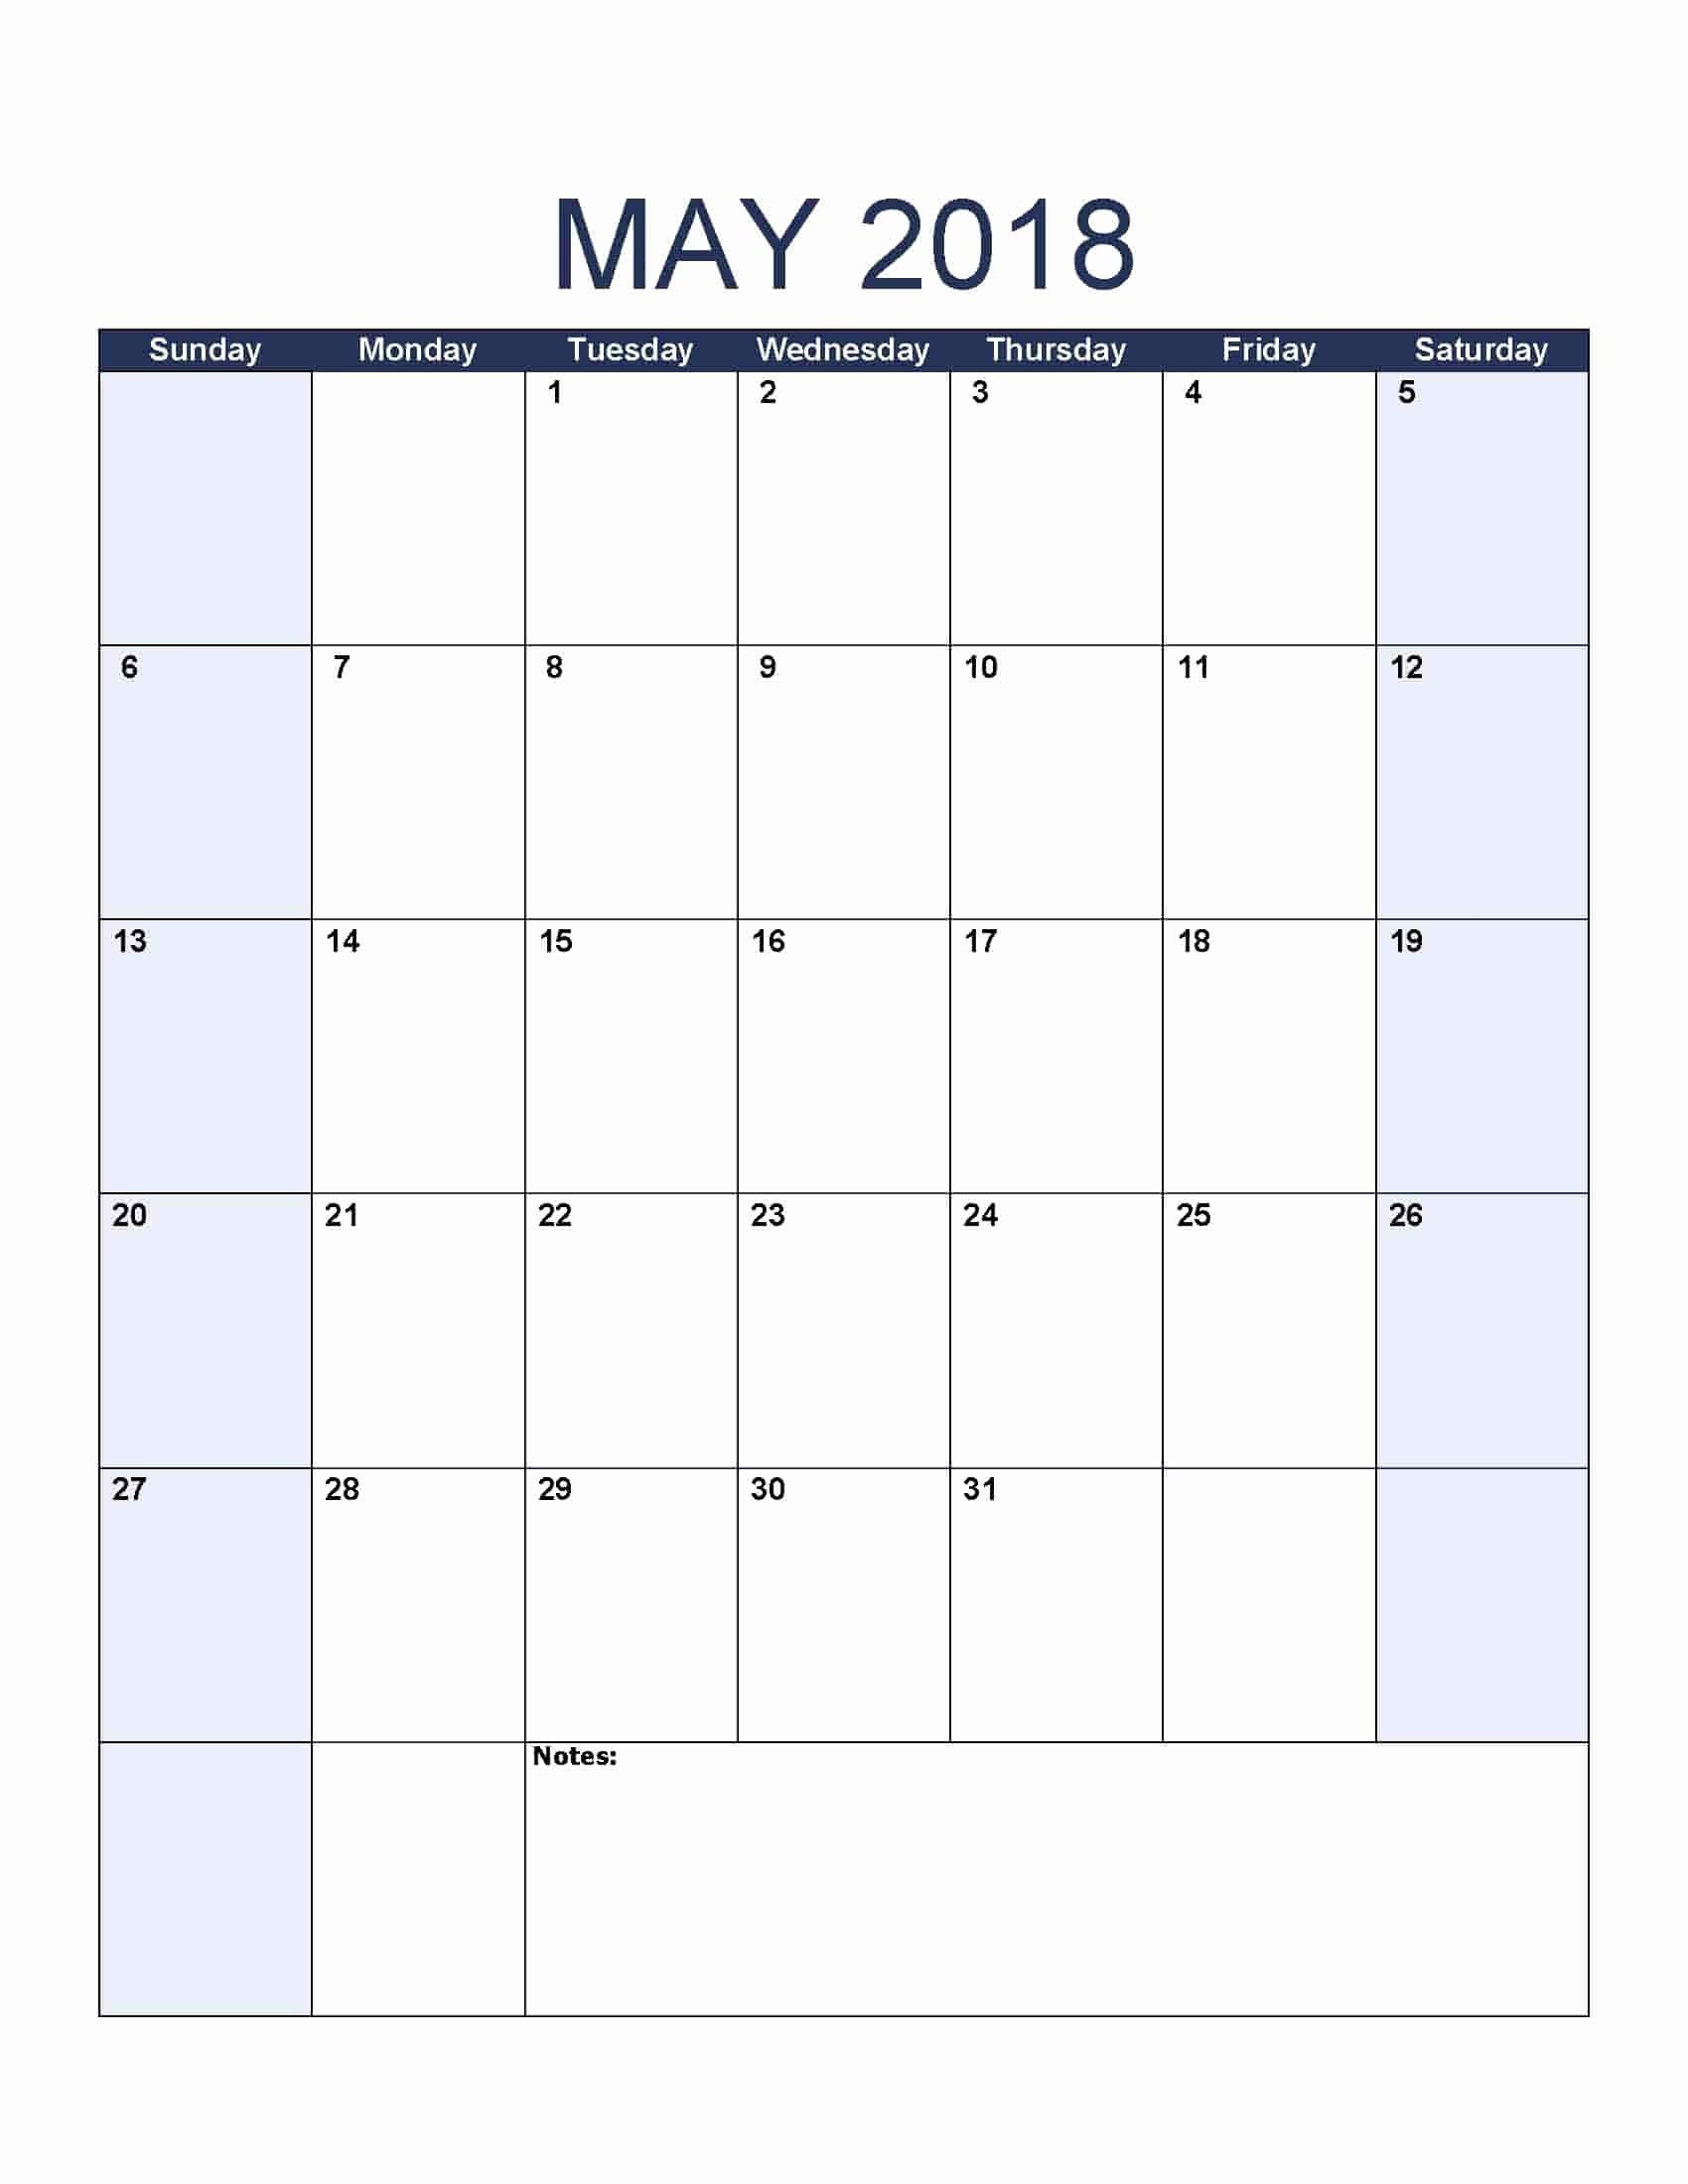 Print Free Calendar Template Awesome May 2018 Calendar Free